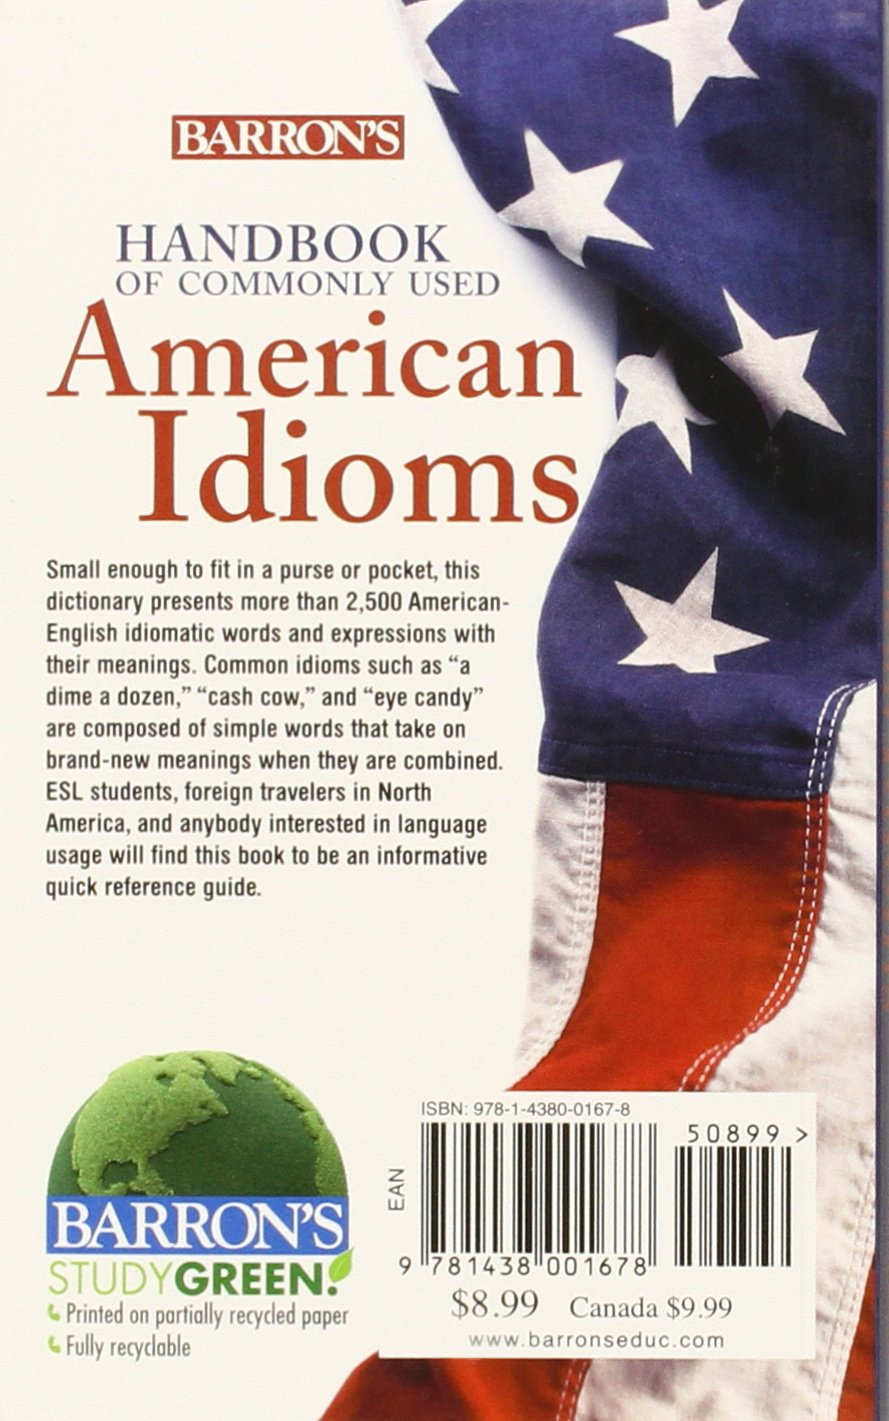 Handbook of Commonly Used American Idioms: Adam Makkai, Maxine T. Boatner,  John E. Gates: 9781438001678: Books - Amazon.ca